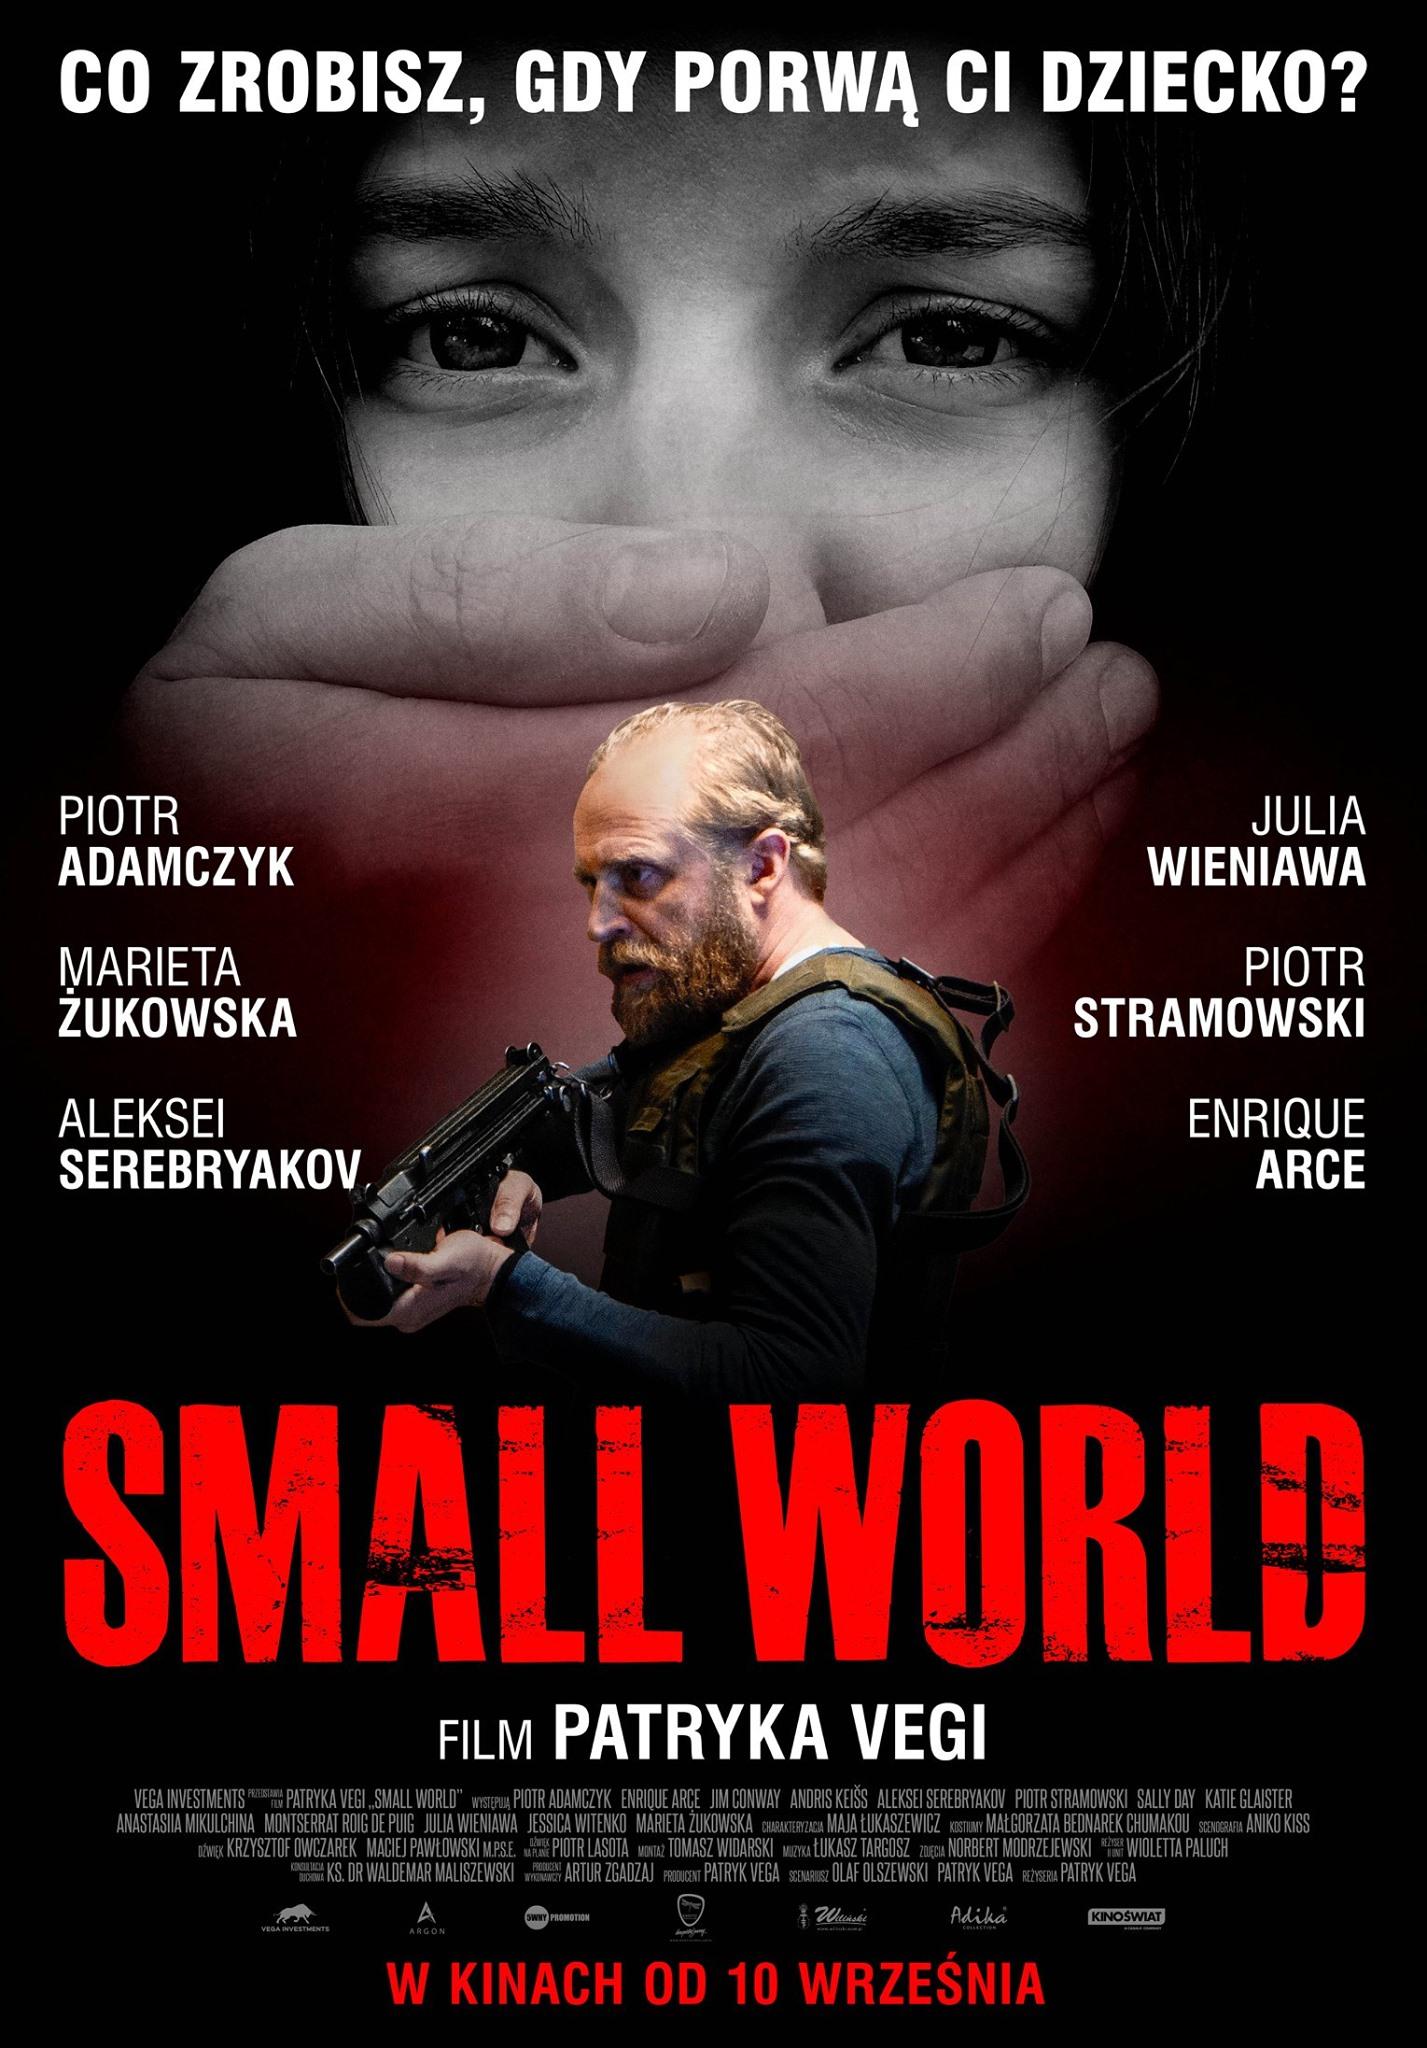 Small world plakat